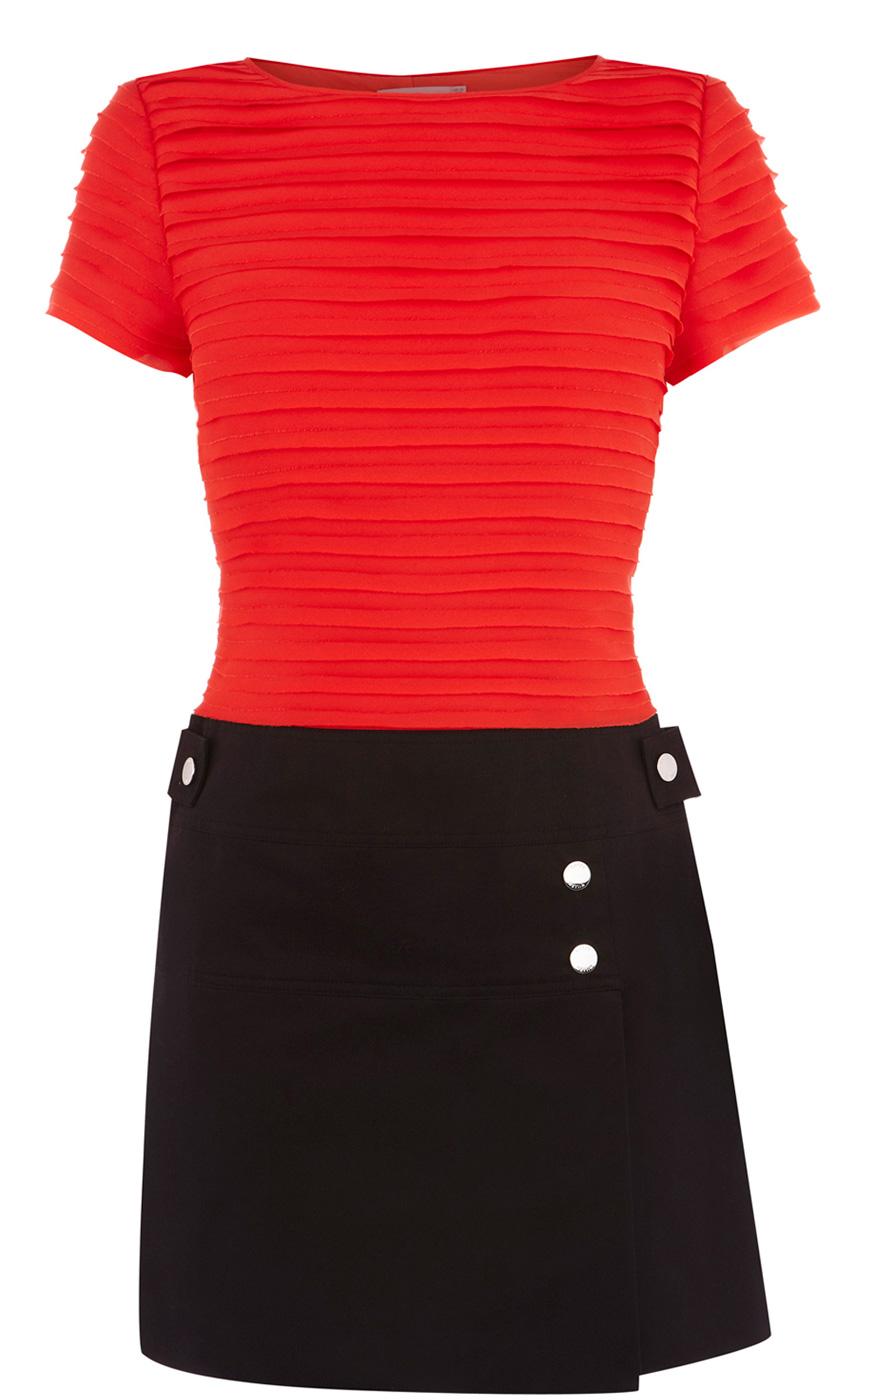 Karen Millen Red Black Colourblock Tunic Womens 434 1 - آداب میزبانی و میهمانی در ضیافت شب یلدا بلندترین شب سال